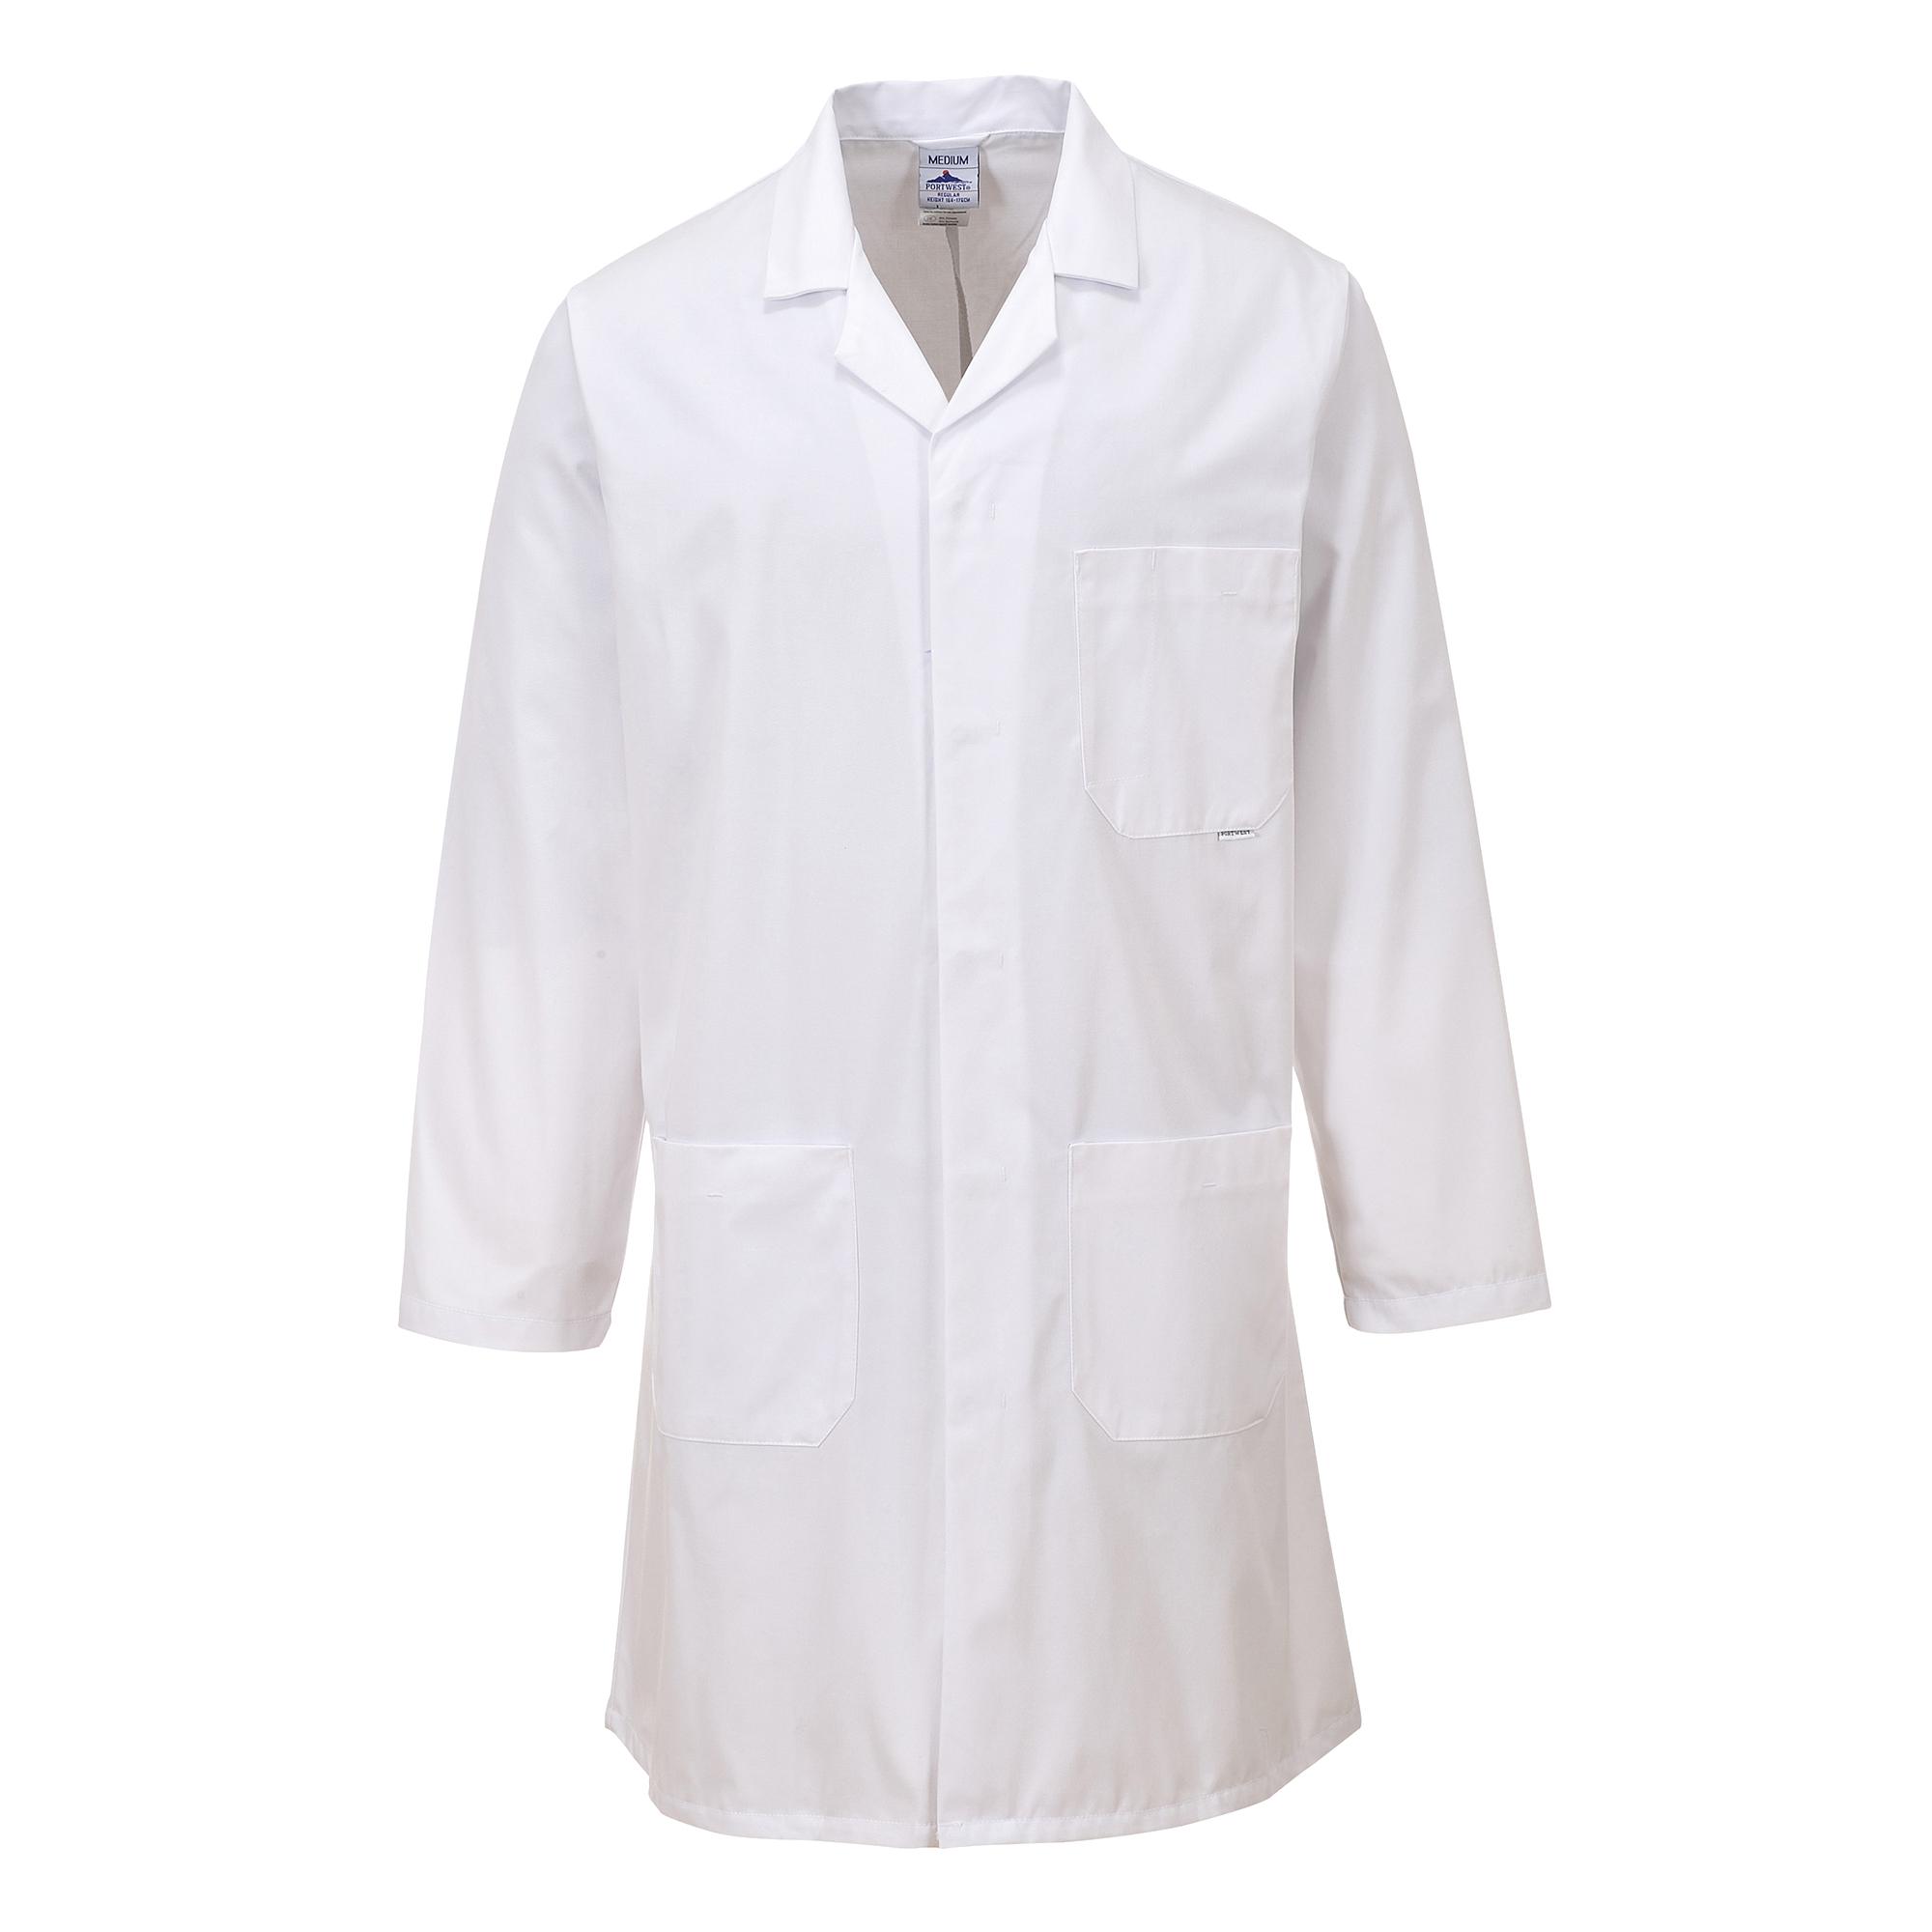 Portwest Standard Workwear Lab Coat (Medical Health) (XS) (White)